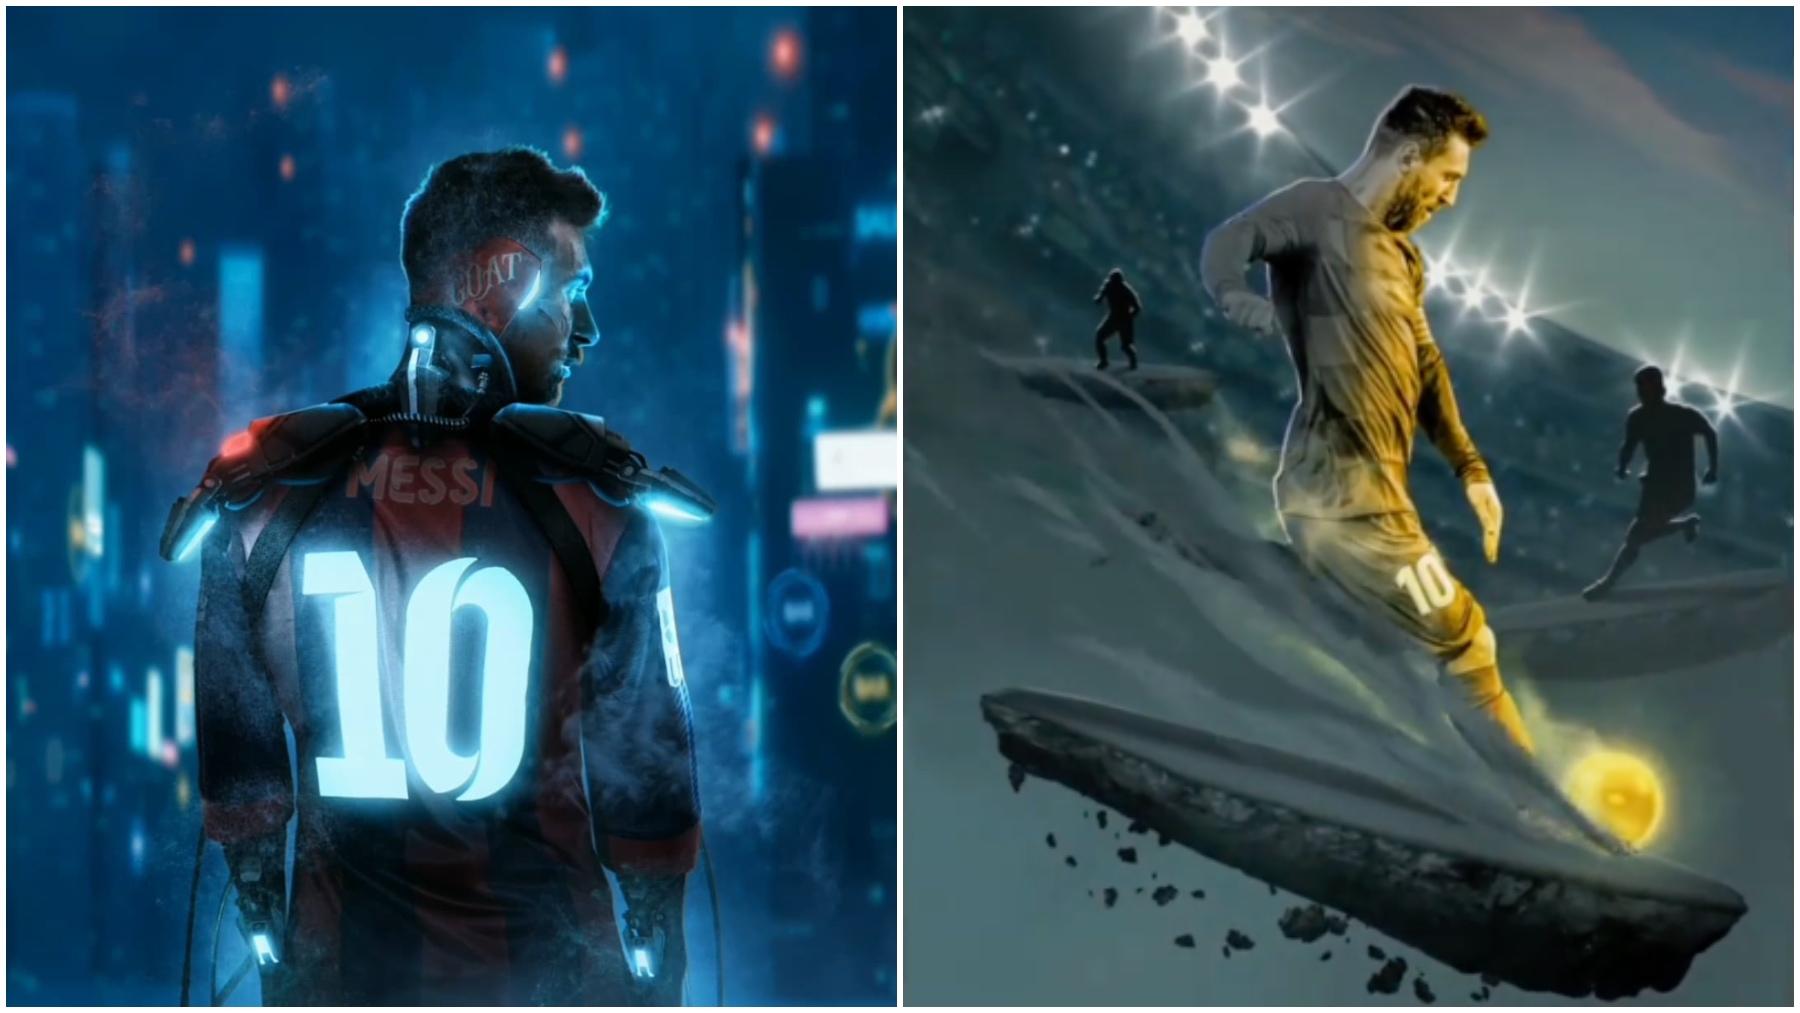 Ilustraciones de BossLogic realizadas para Leo Messi (@bosslogic · @leomessi)